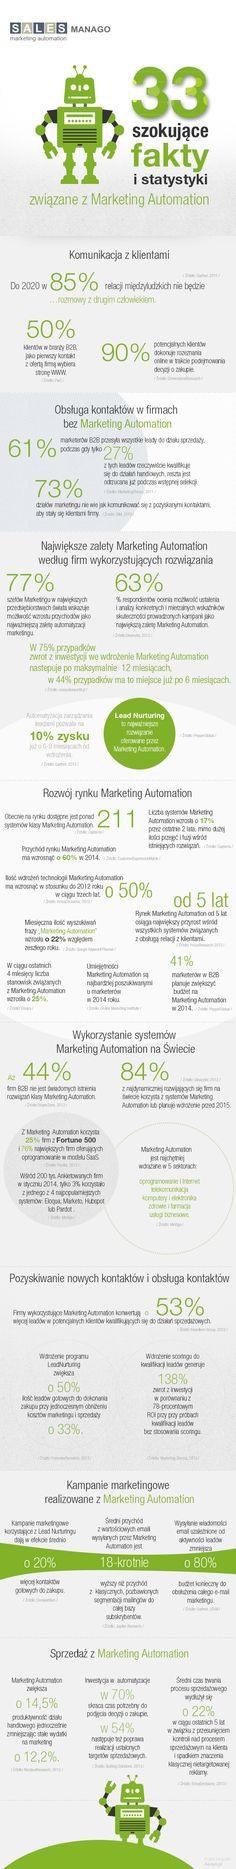 infographic - Marketing Automation / SALESmanago.com